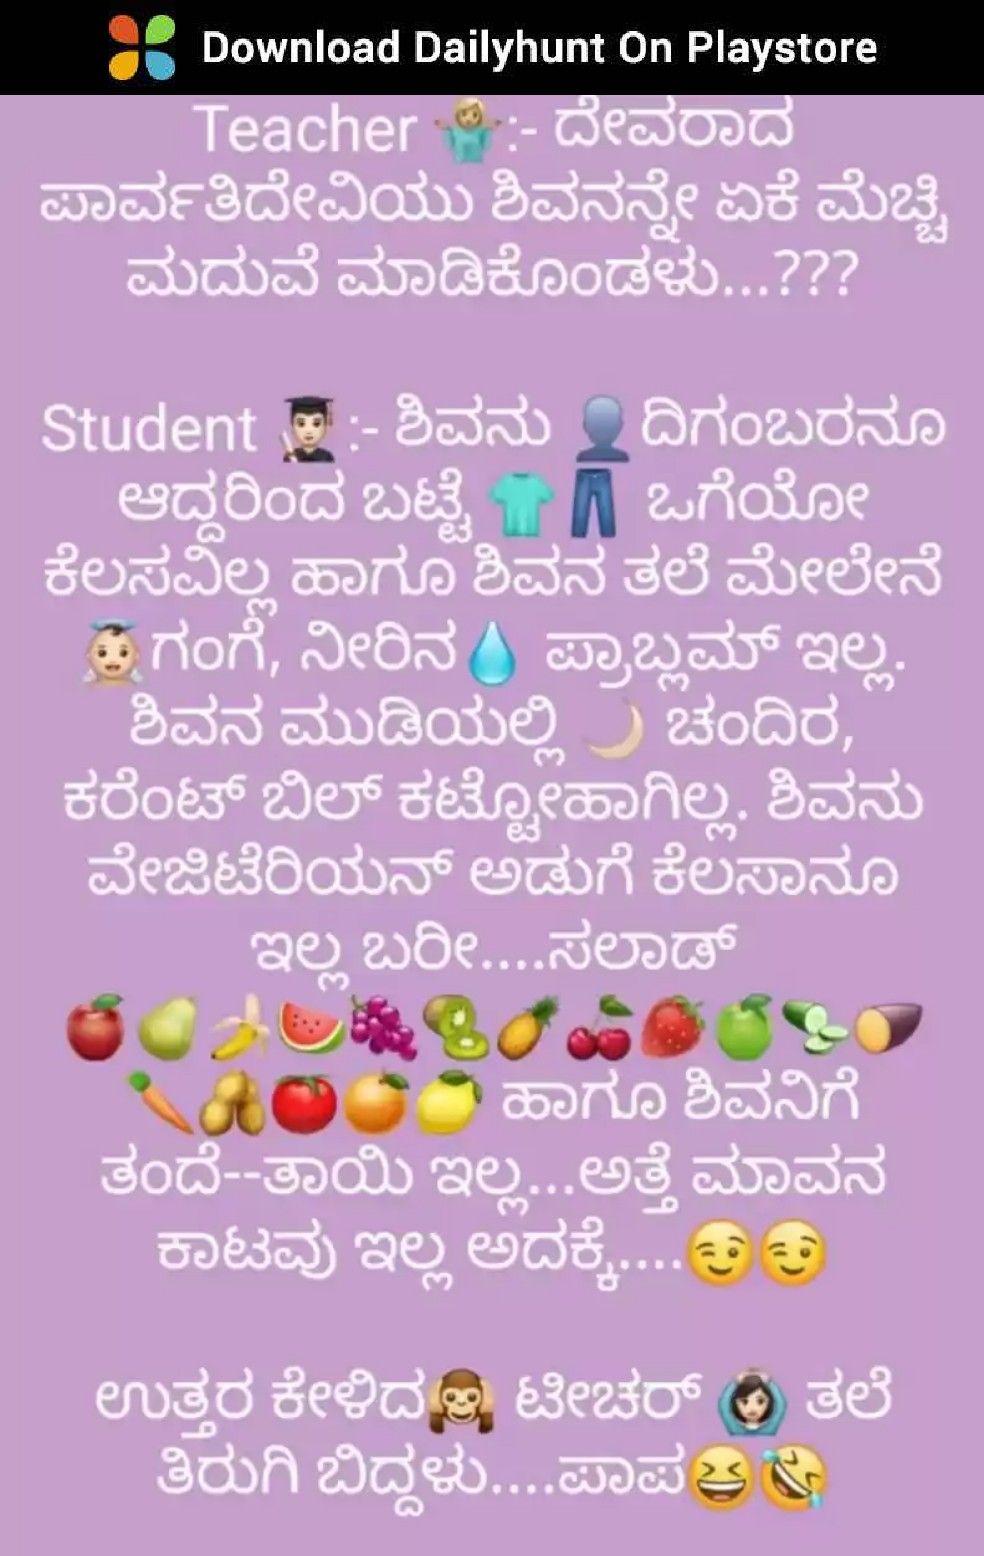 Pin By Girish T Giri On Wallpapers School Quotes Funny Saving Quotes Funny School Jokes